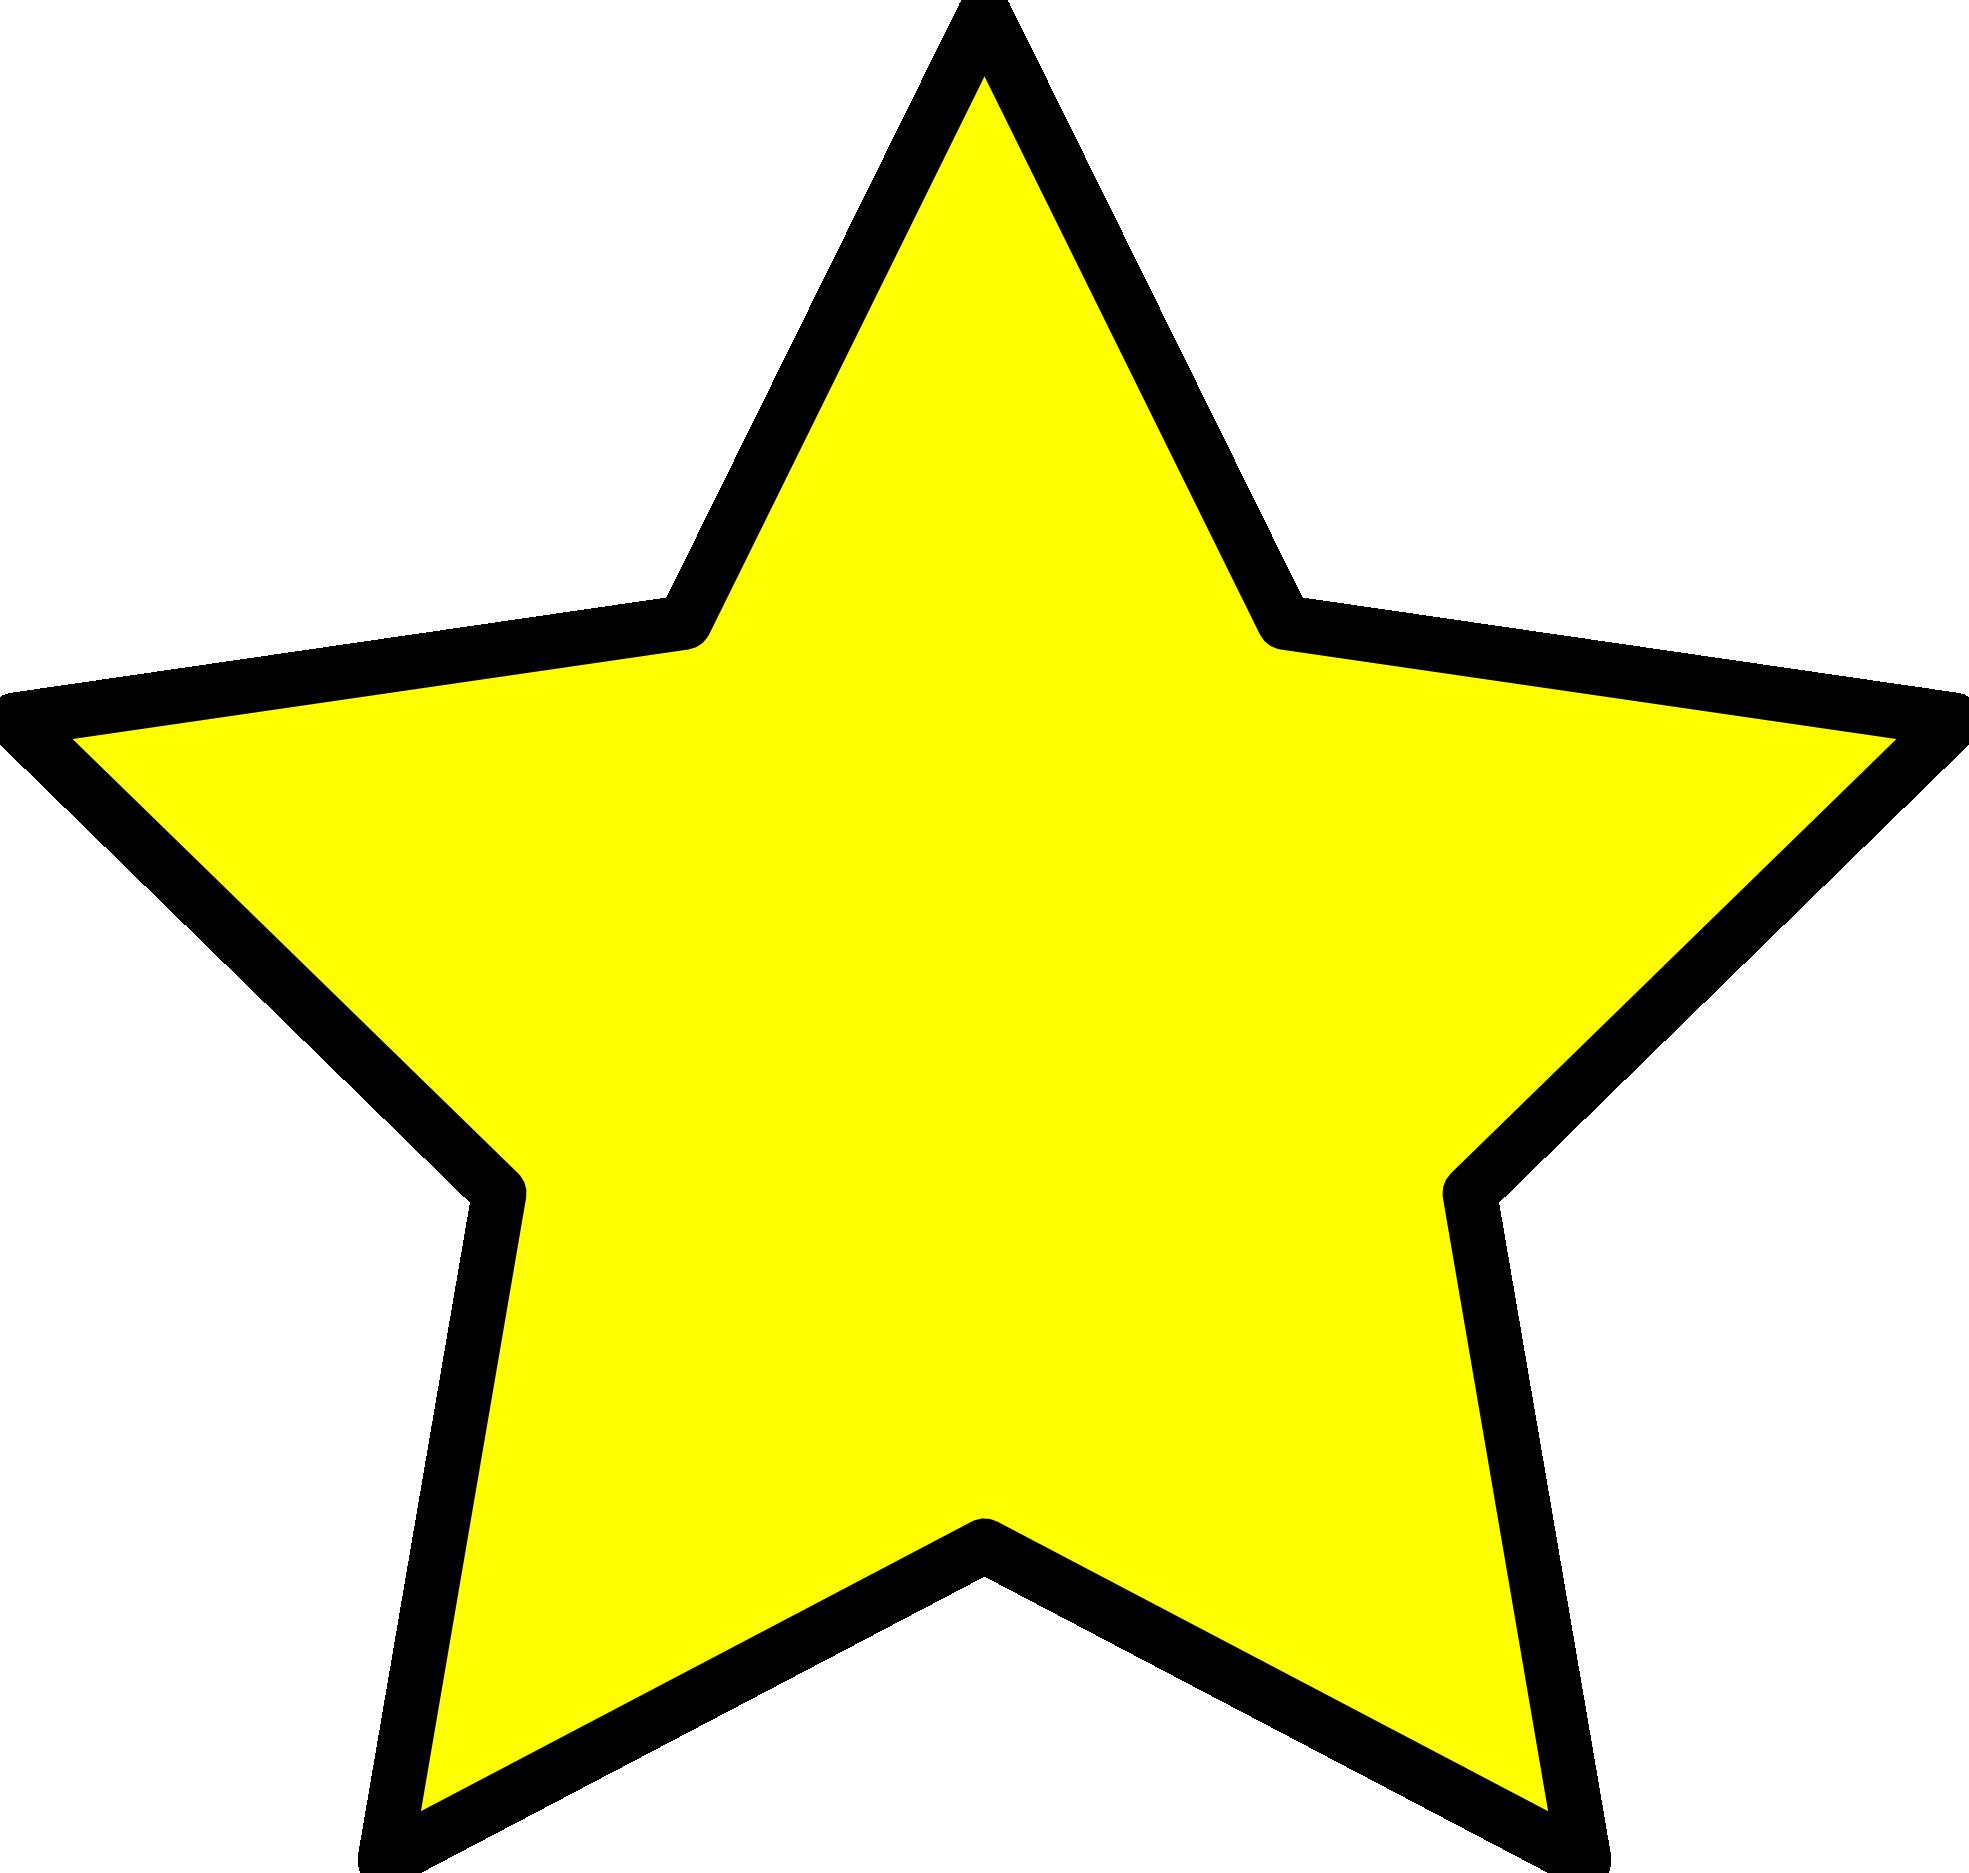 clipart star - Star Clip Art